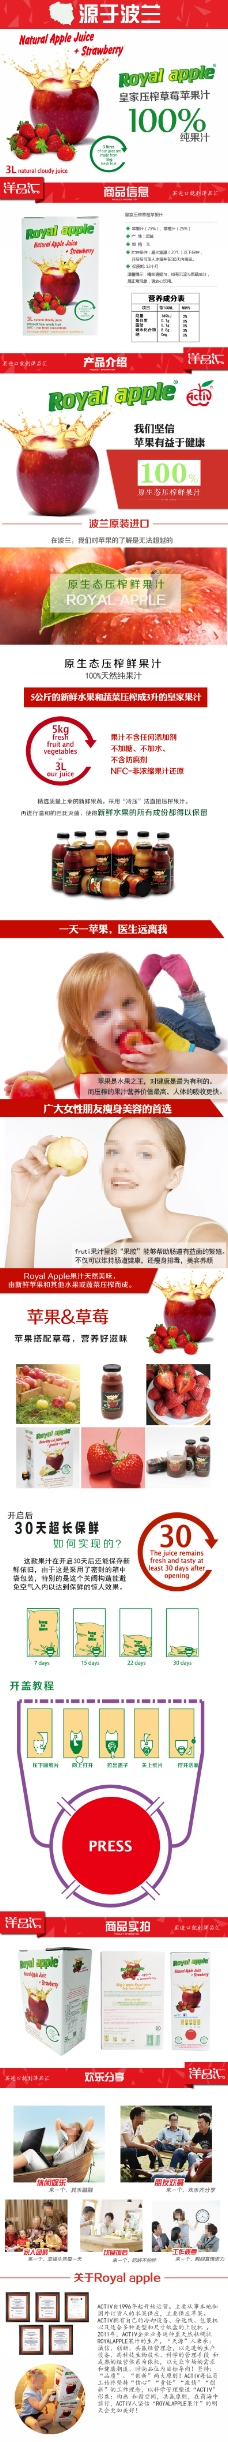 Royal压榨苹果草莓汁3L